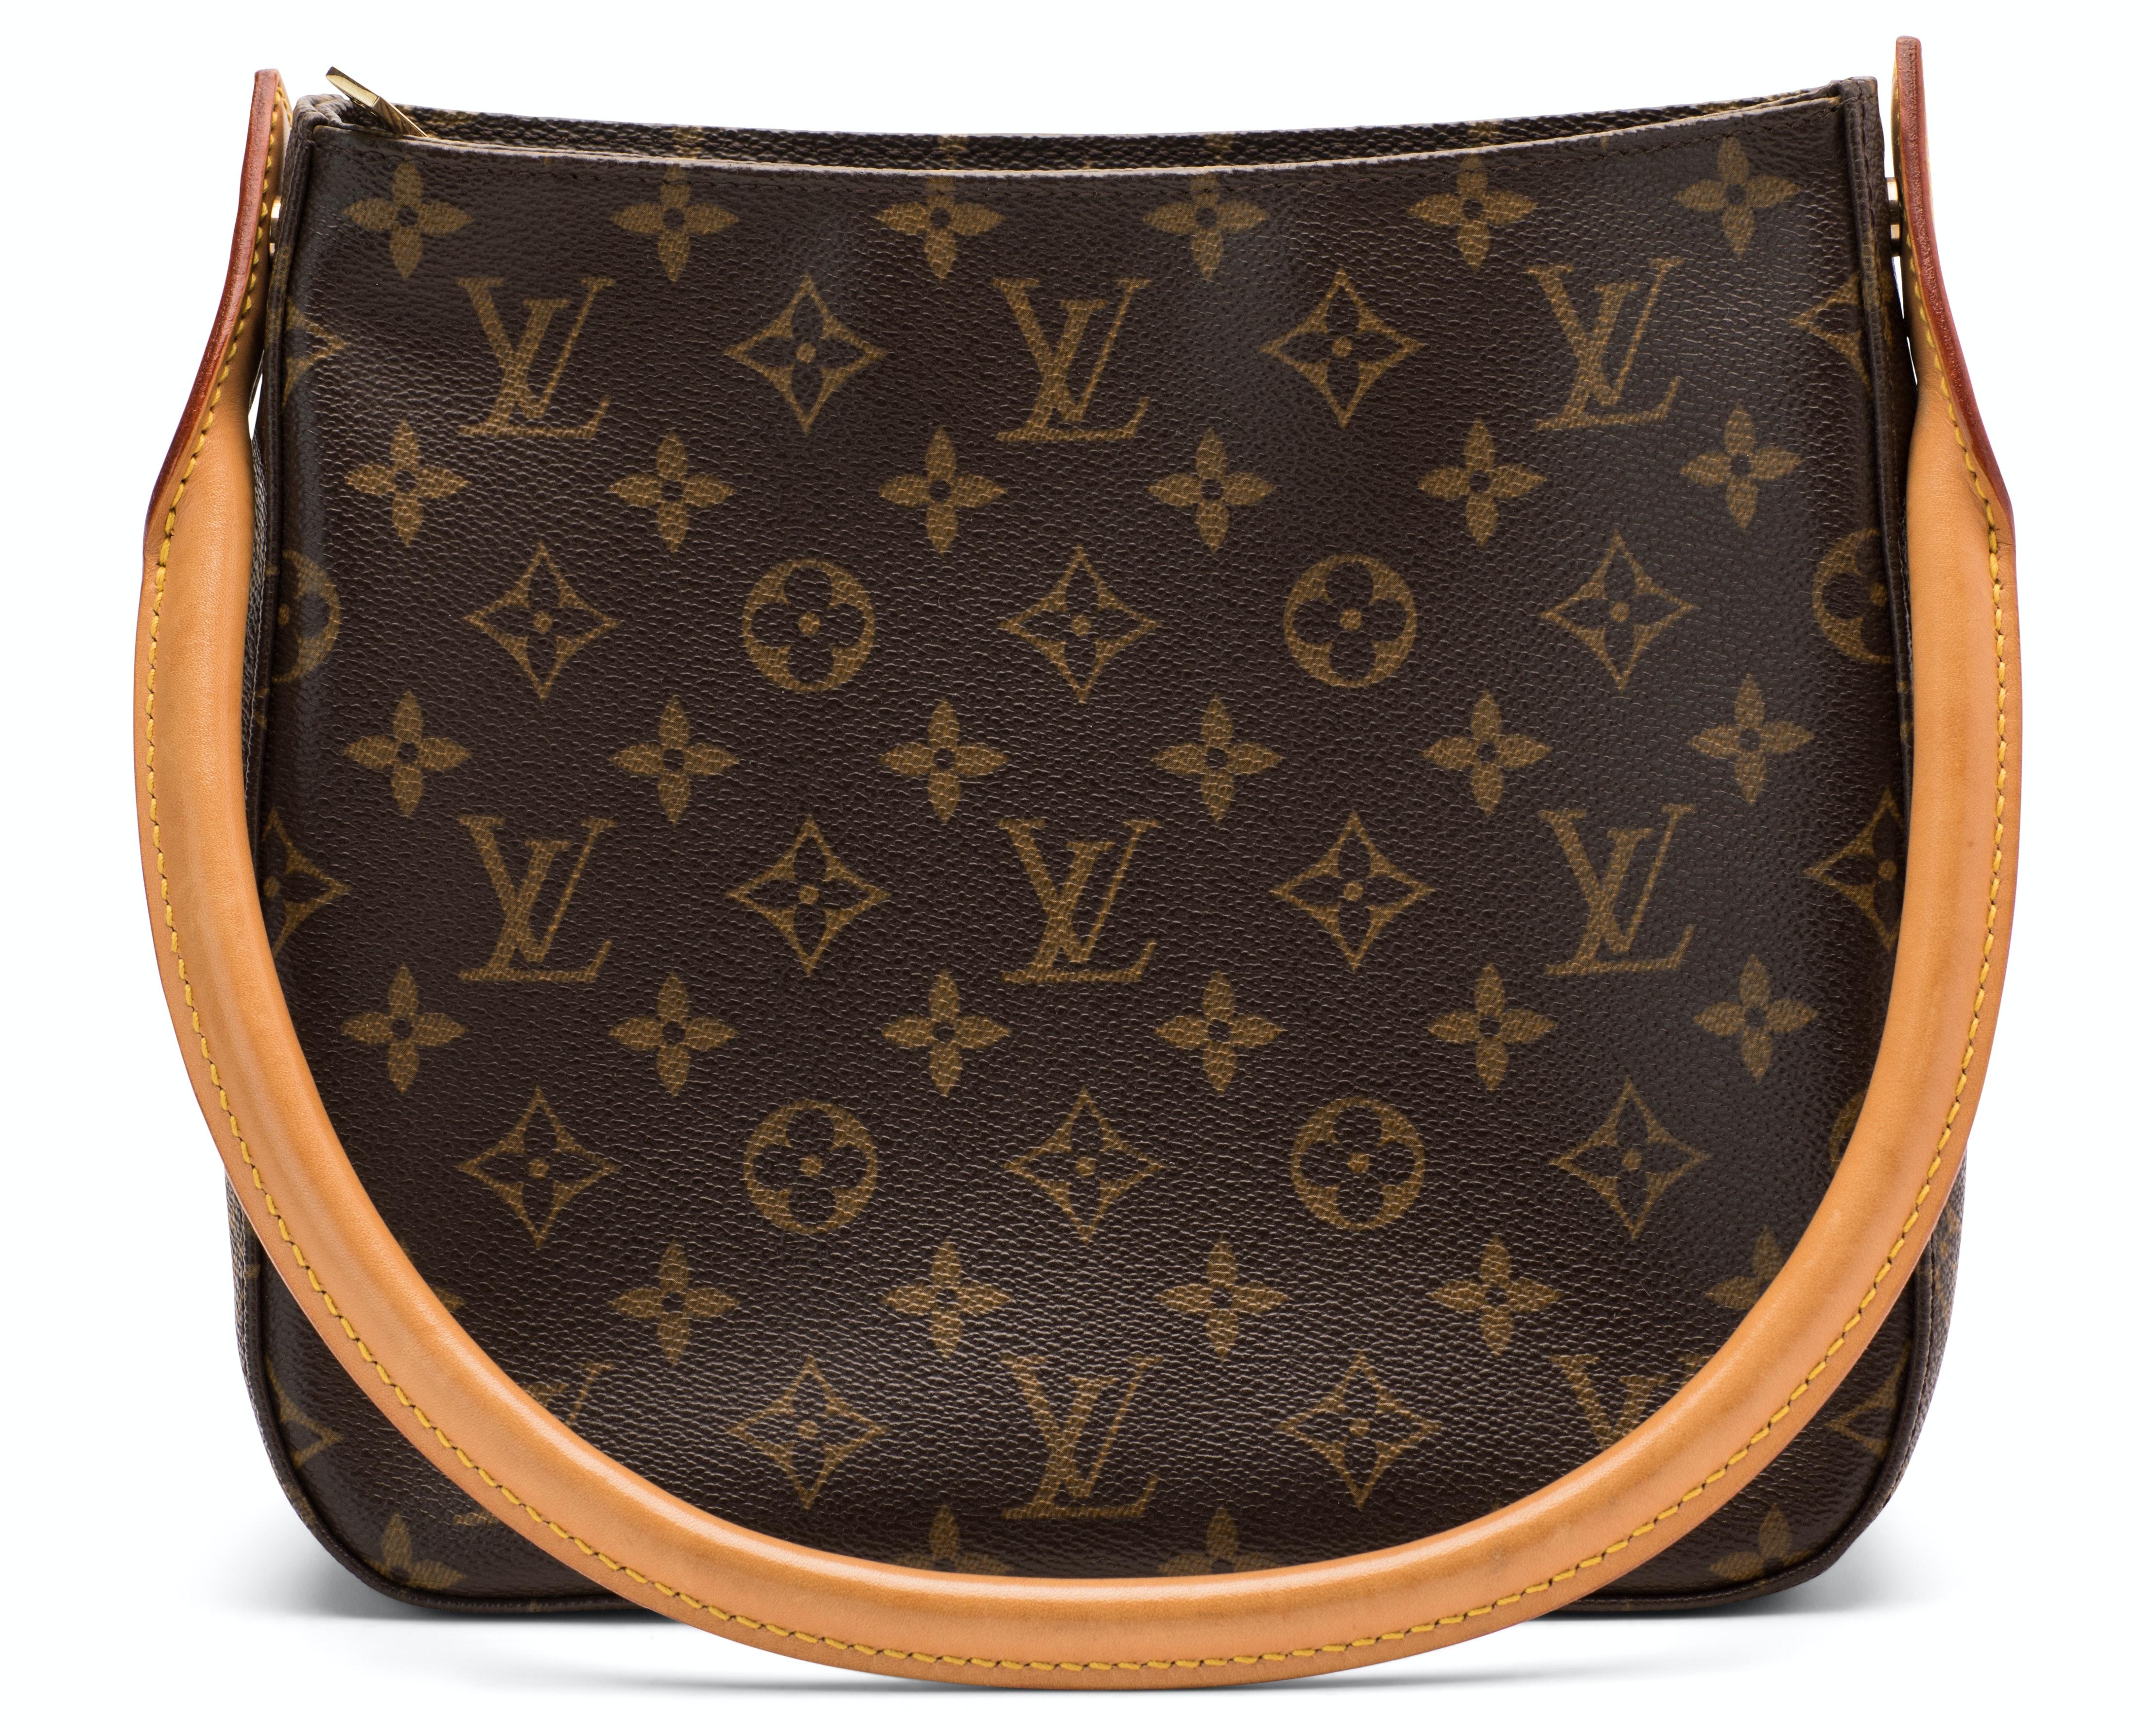 Louis Vuitton Looping Monogram MM Brown